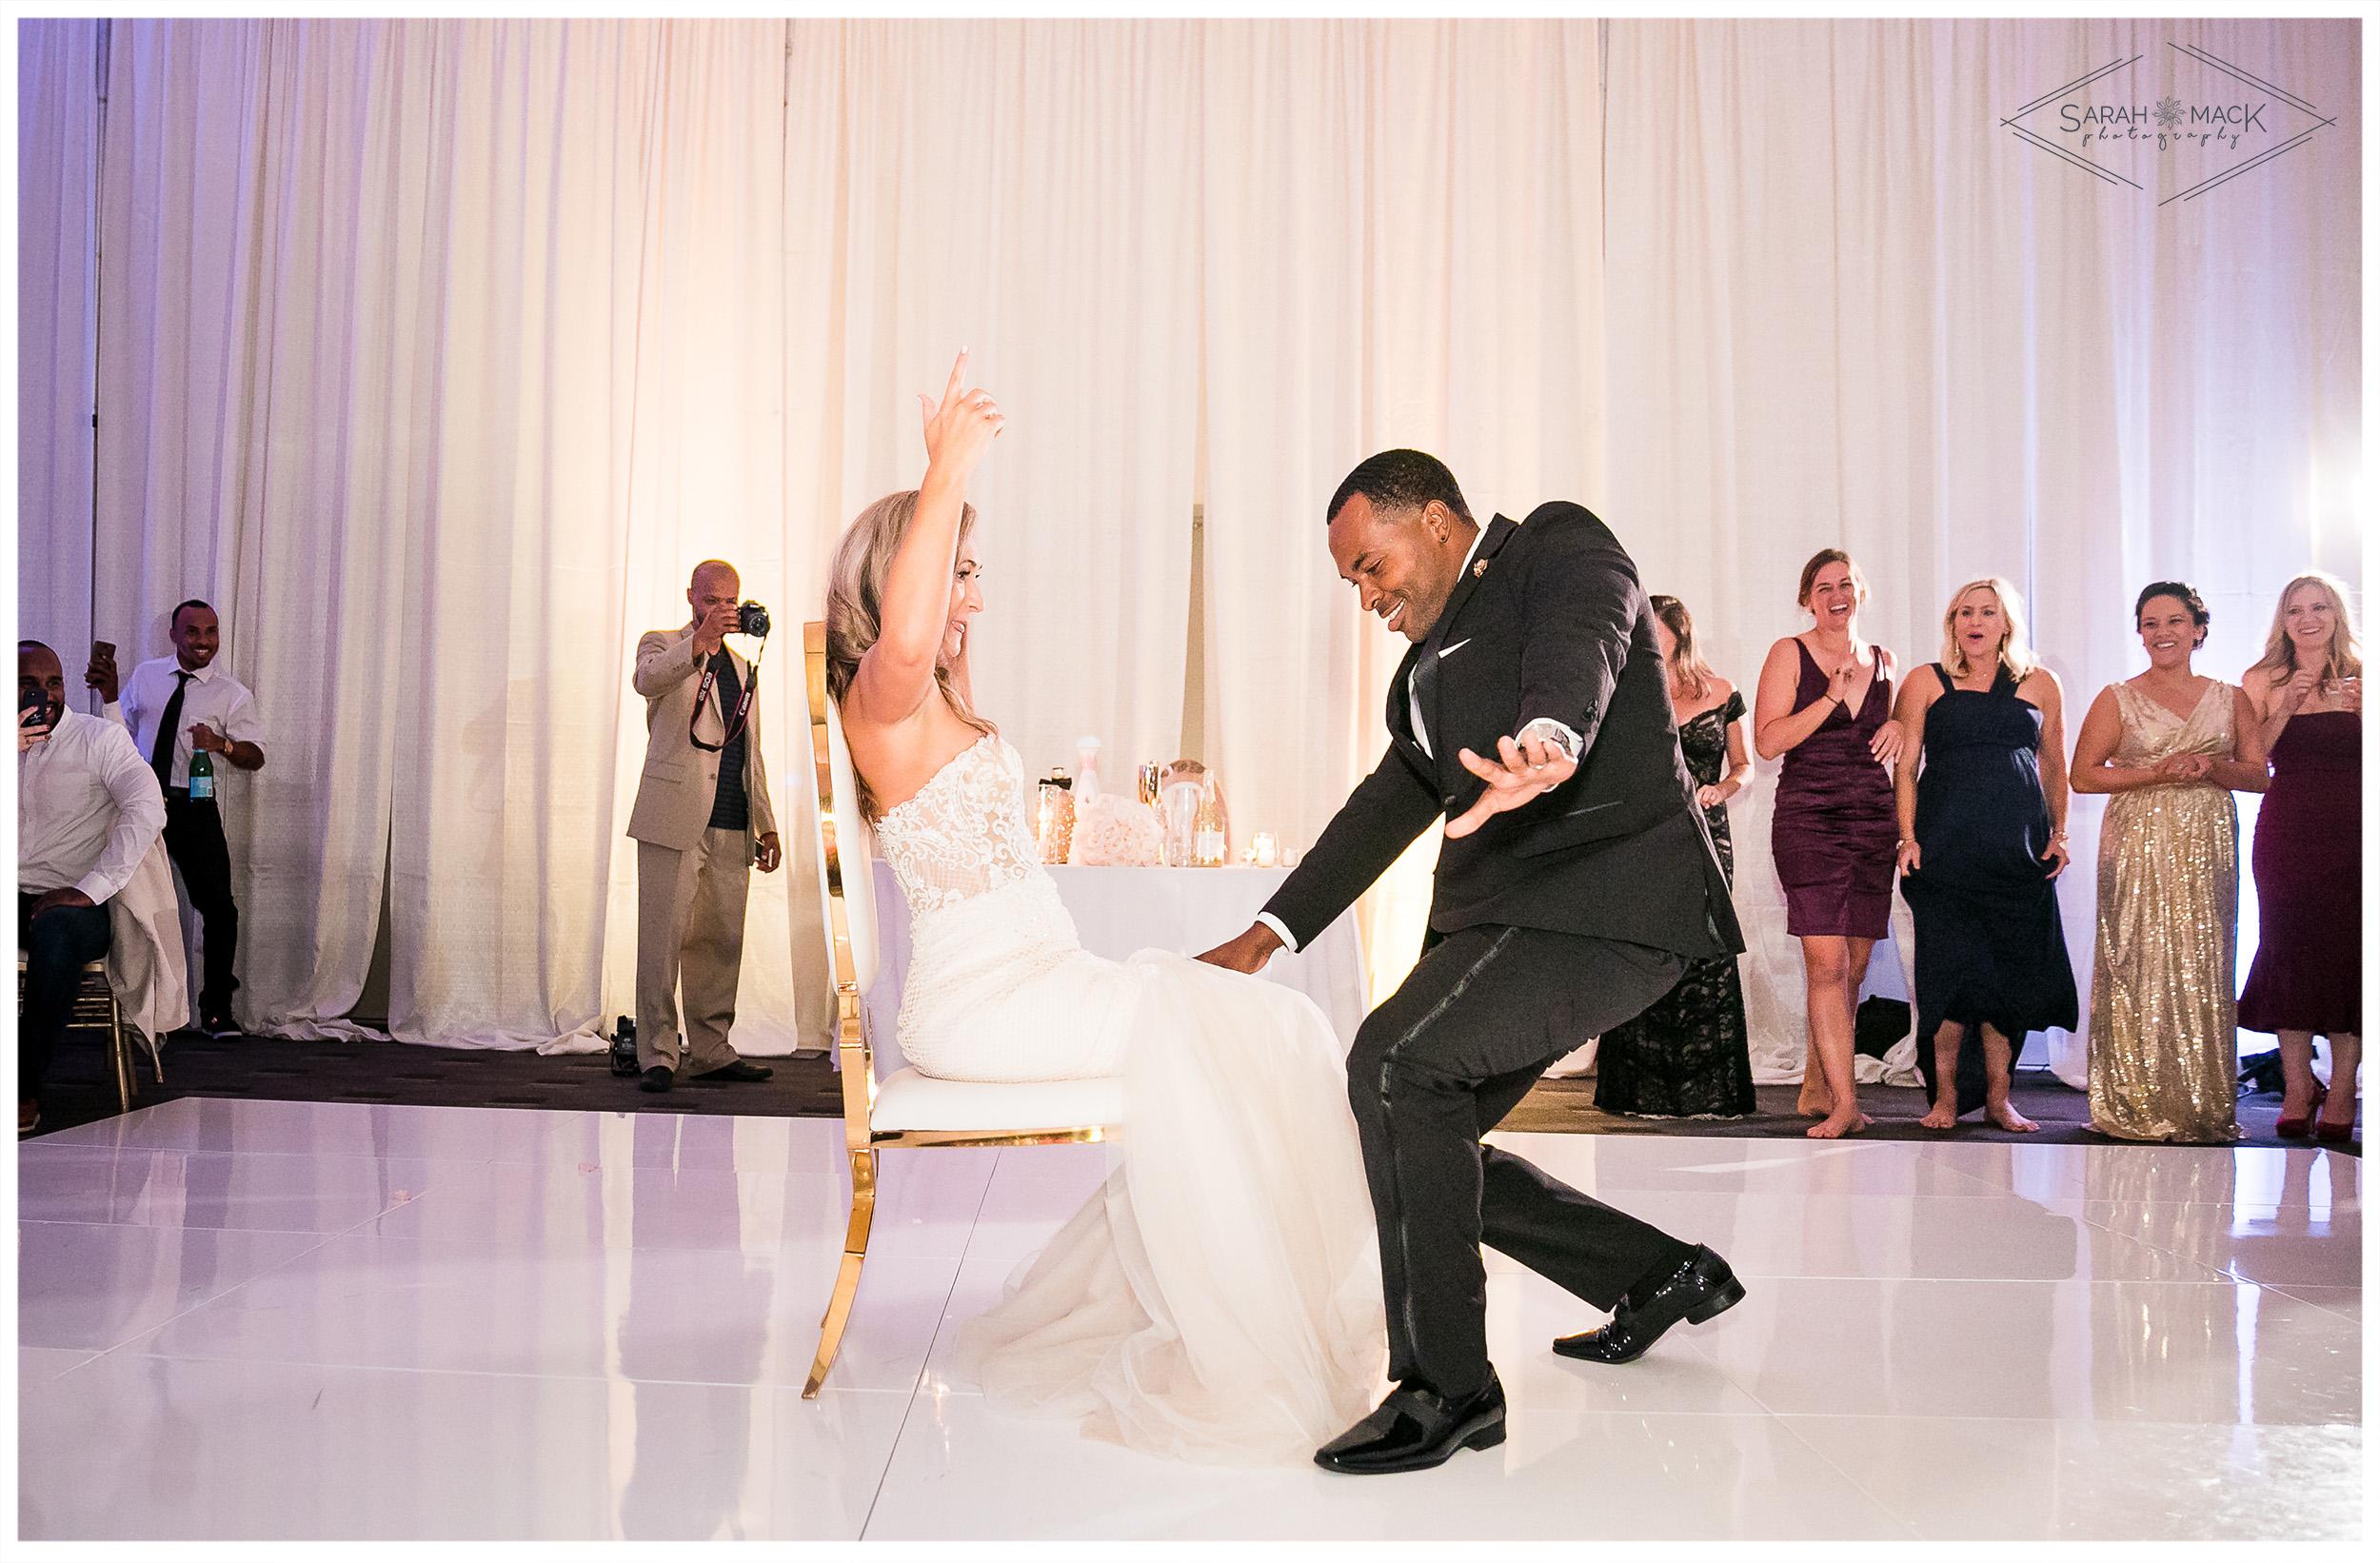 MK-Santa-Monica-Catholic-Church-Wedding-Photography-60.jpg